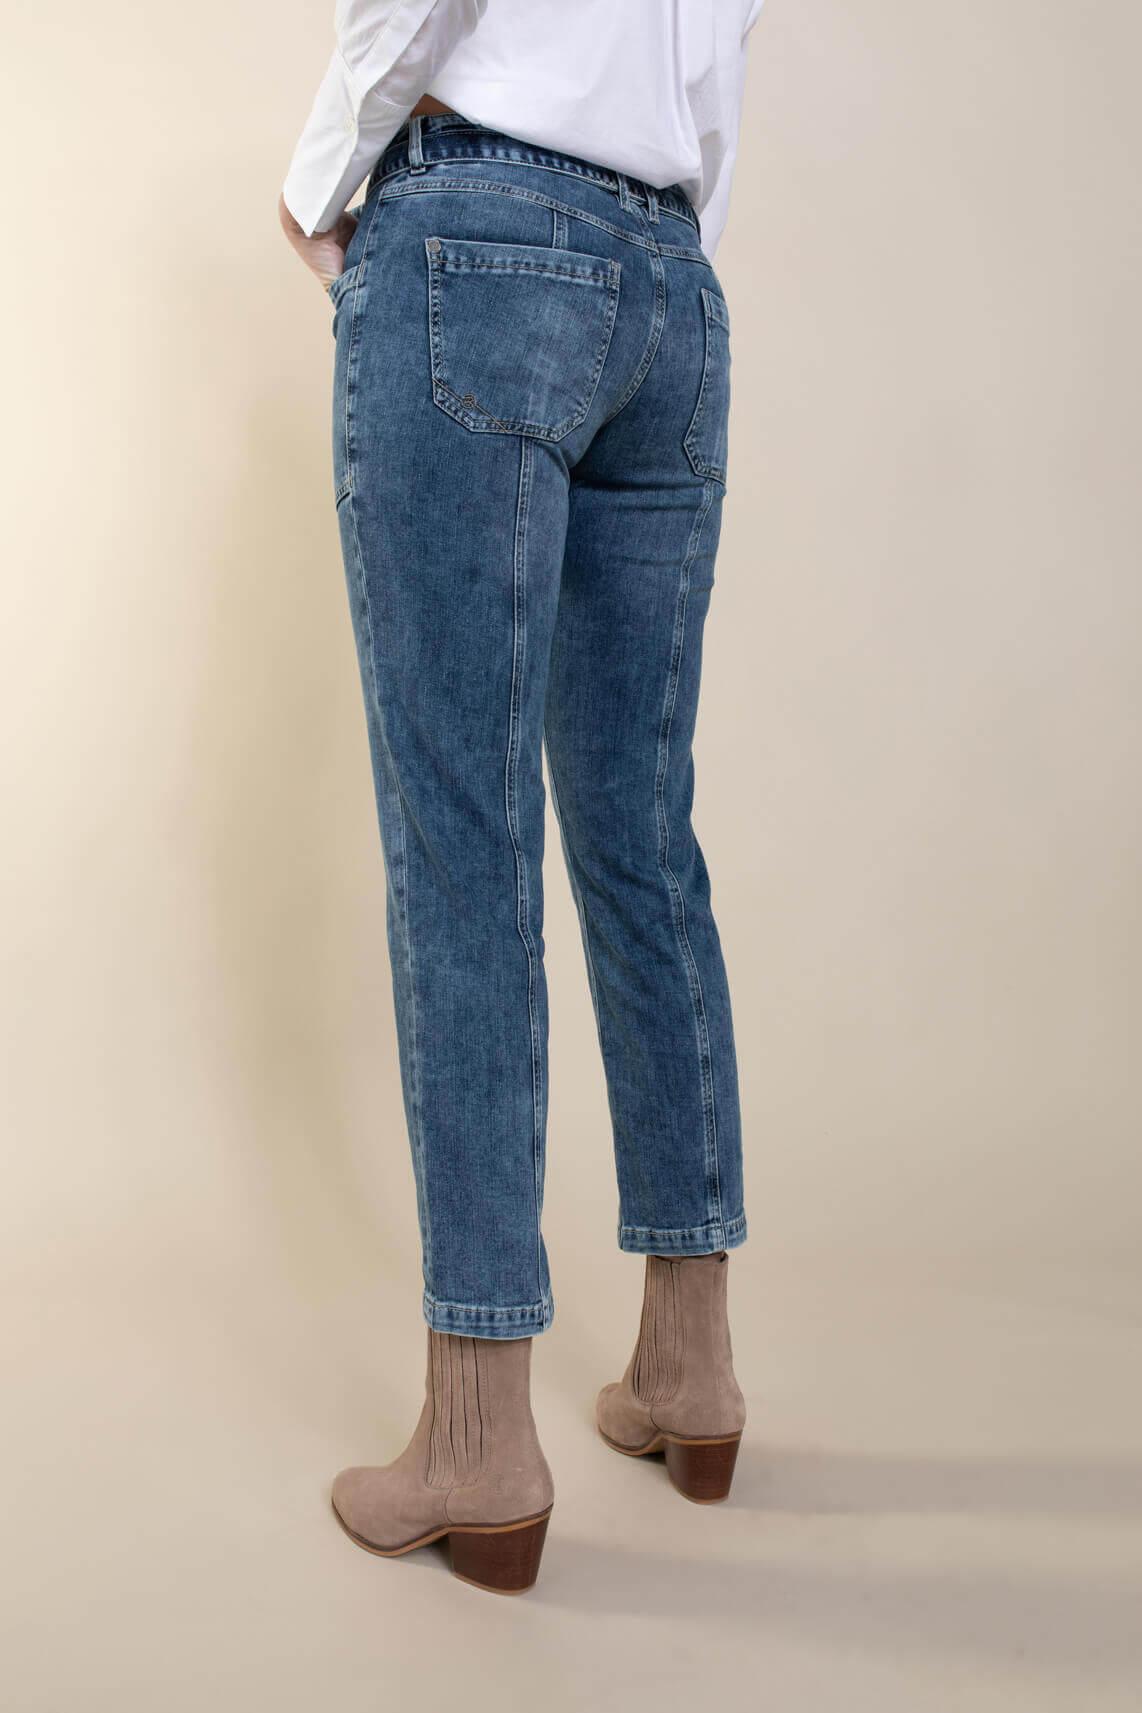 Rosner Dames L30 Masha jeans Blauw